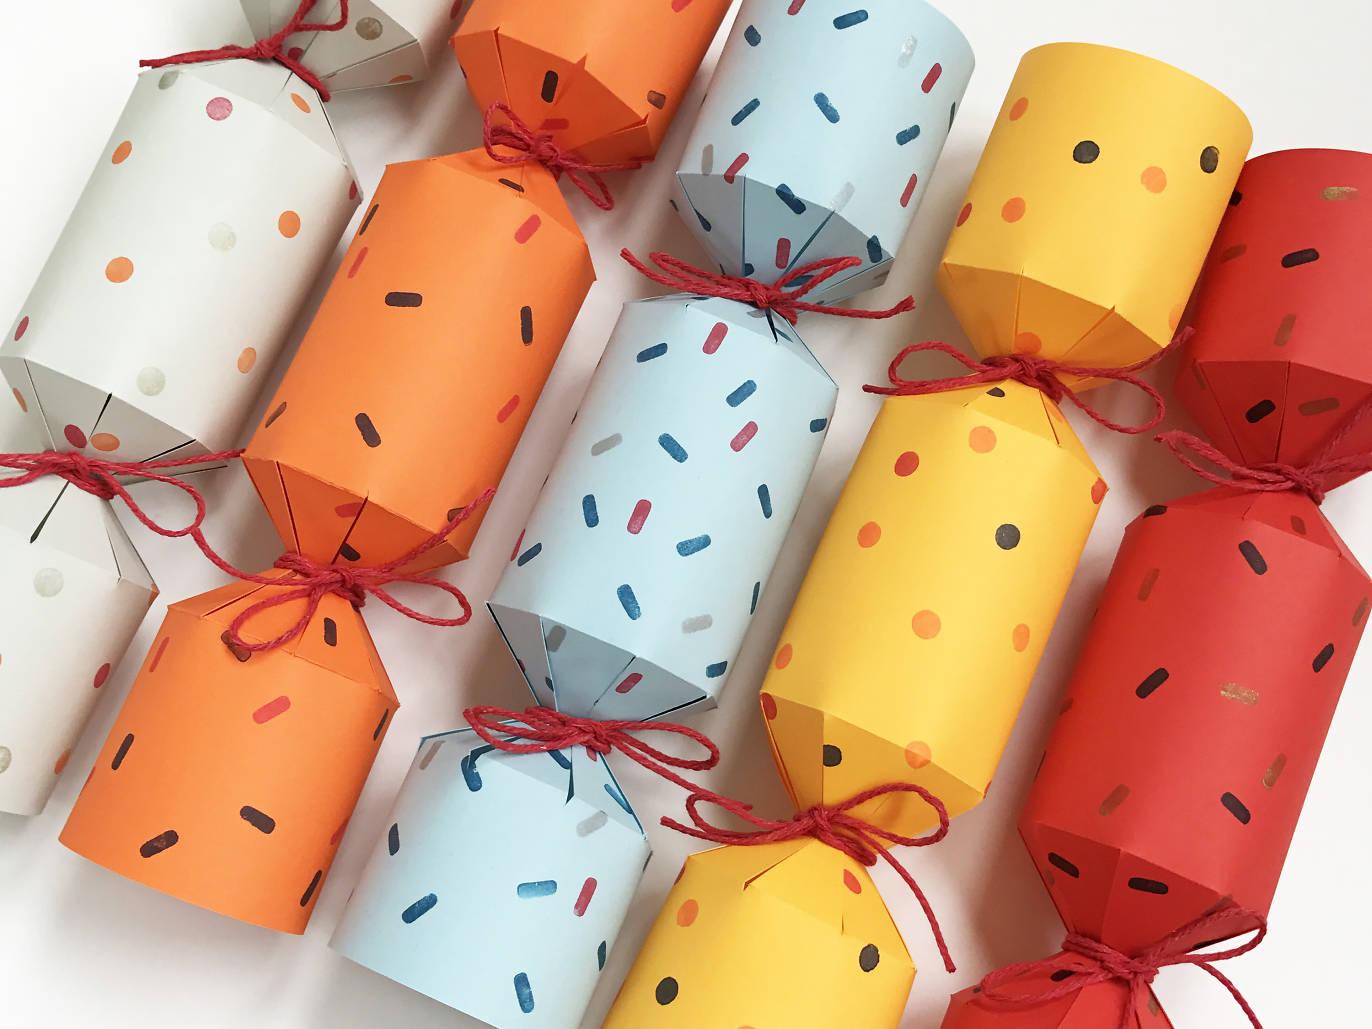 Moquette Christmas Cracker-Making Workshop